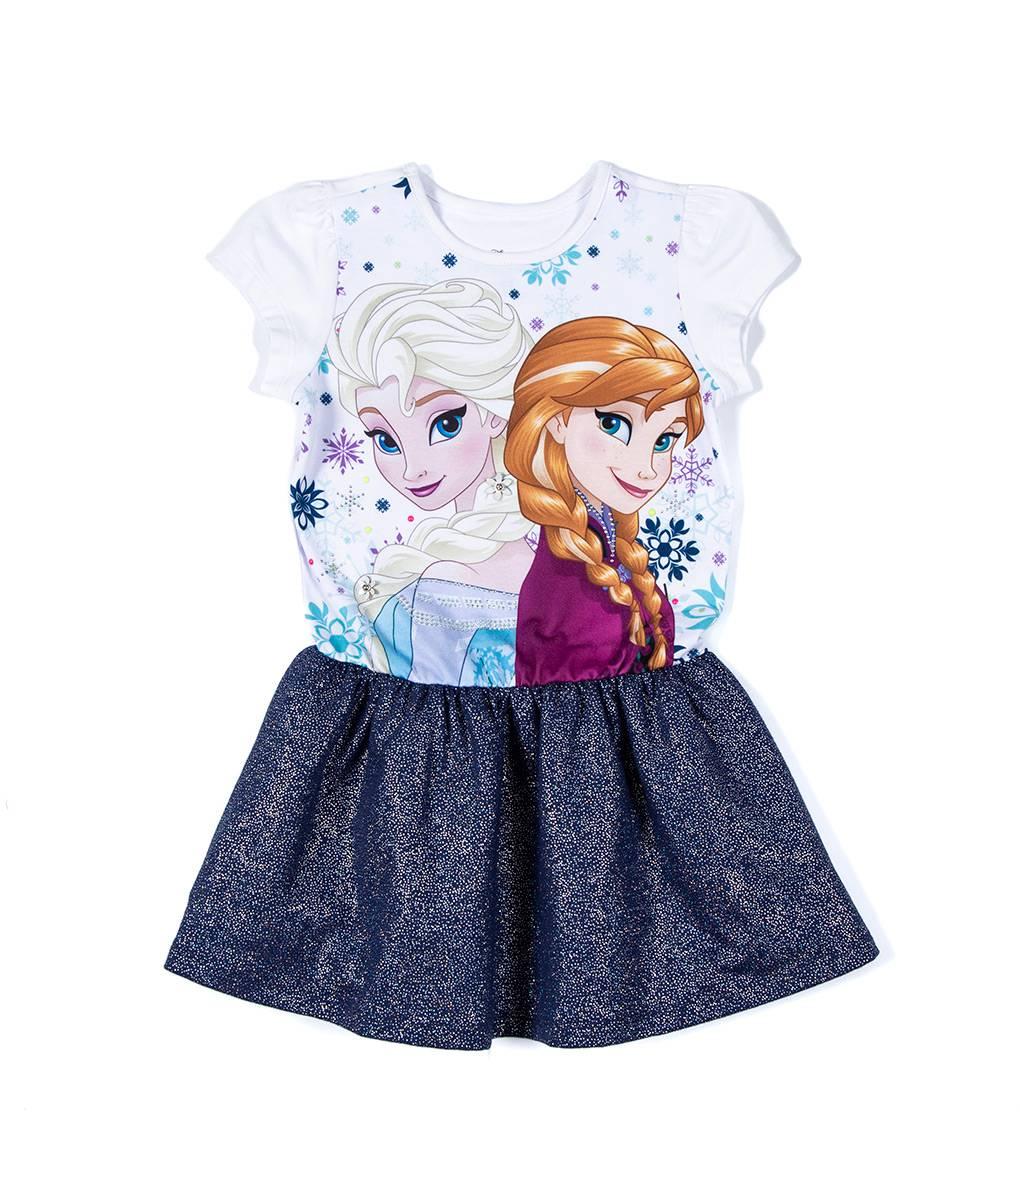 Vestido niña Frozen               Tallas: 4          Precio: $20,00